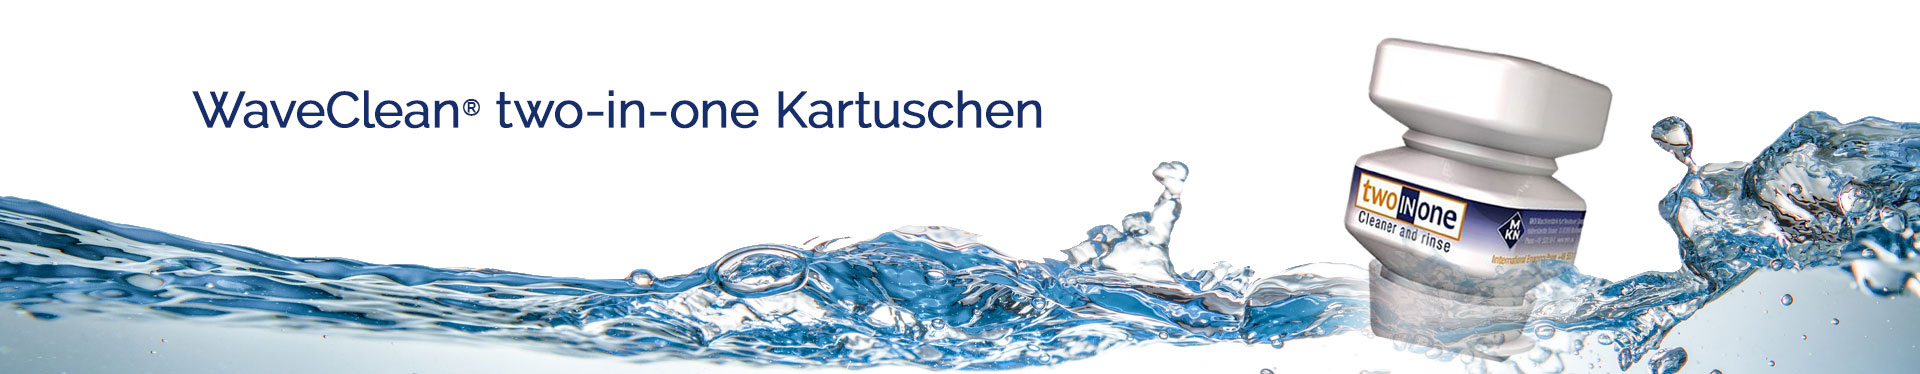 MKN WaveClean Banner